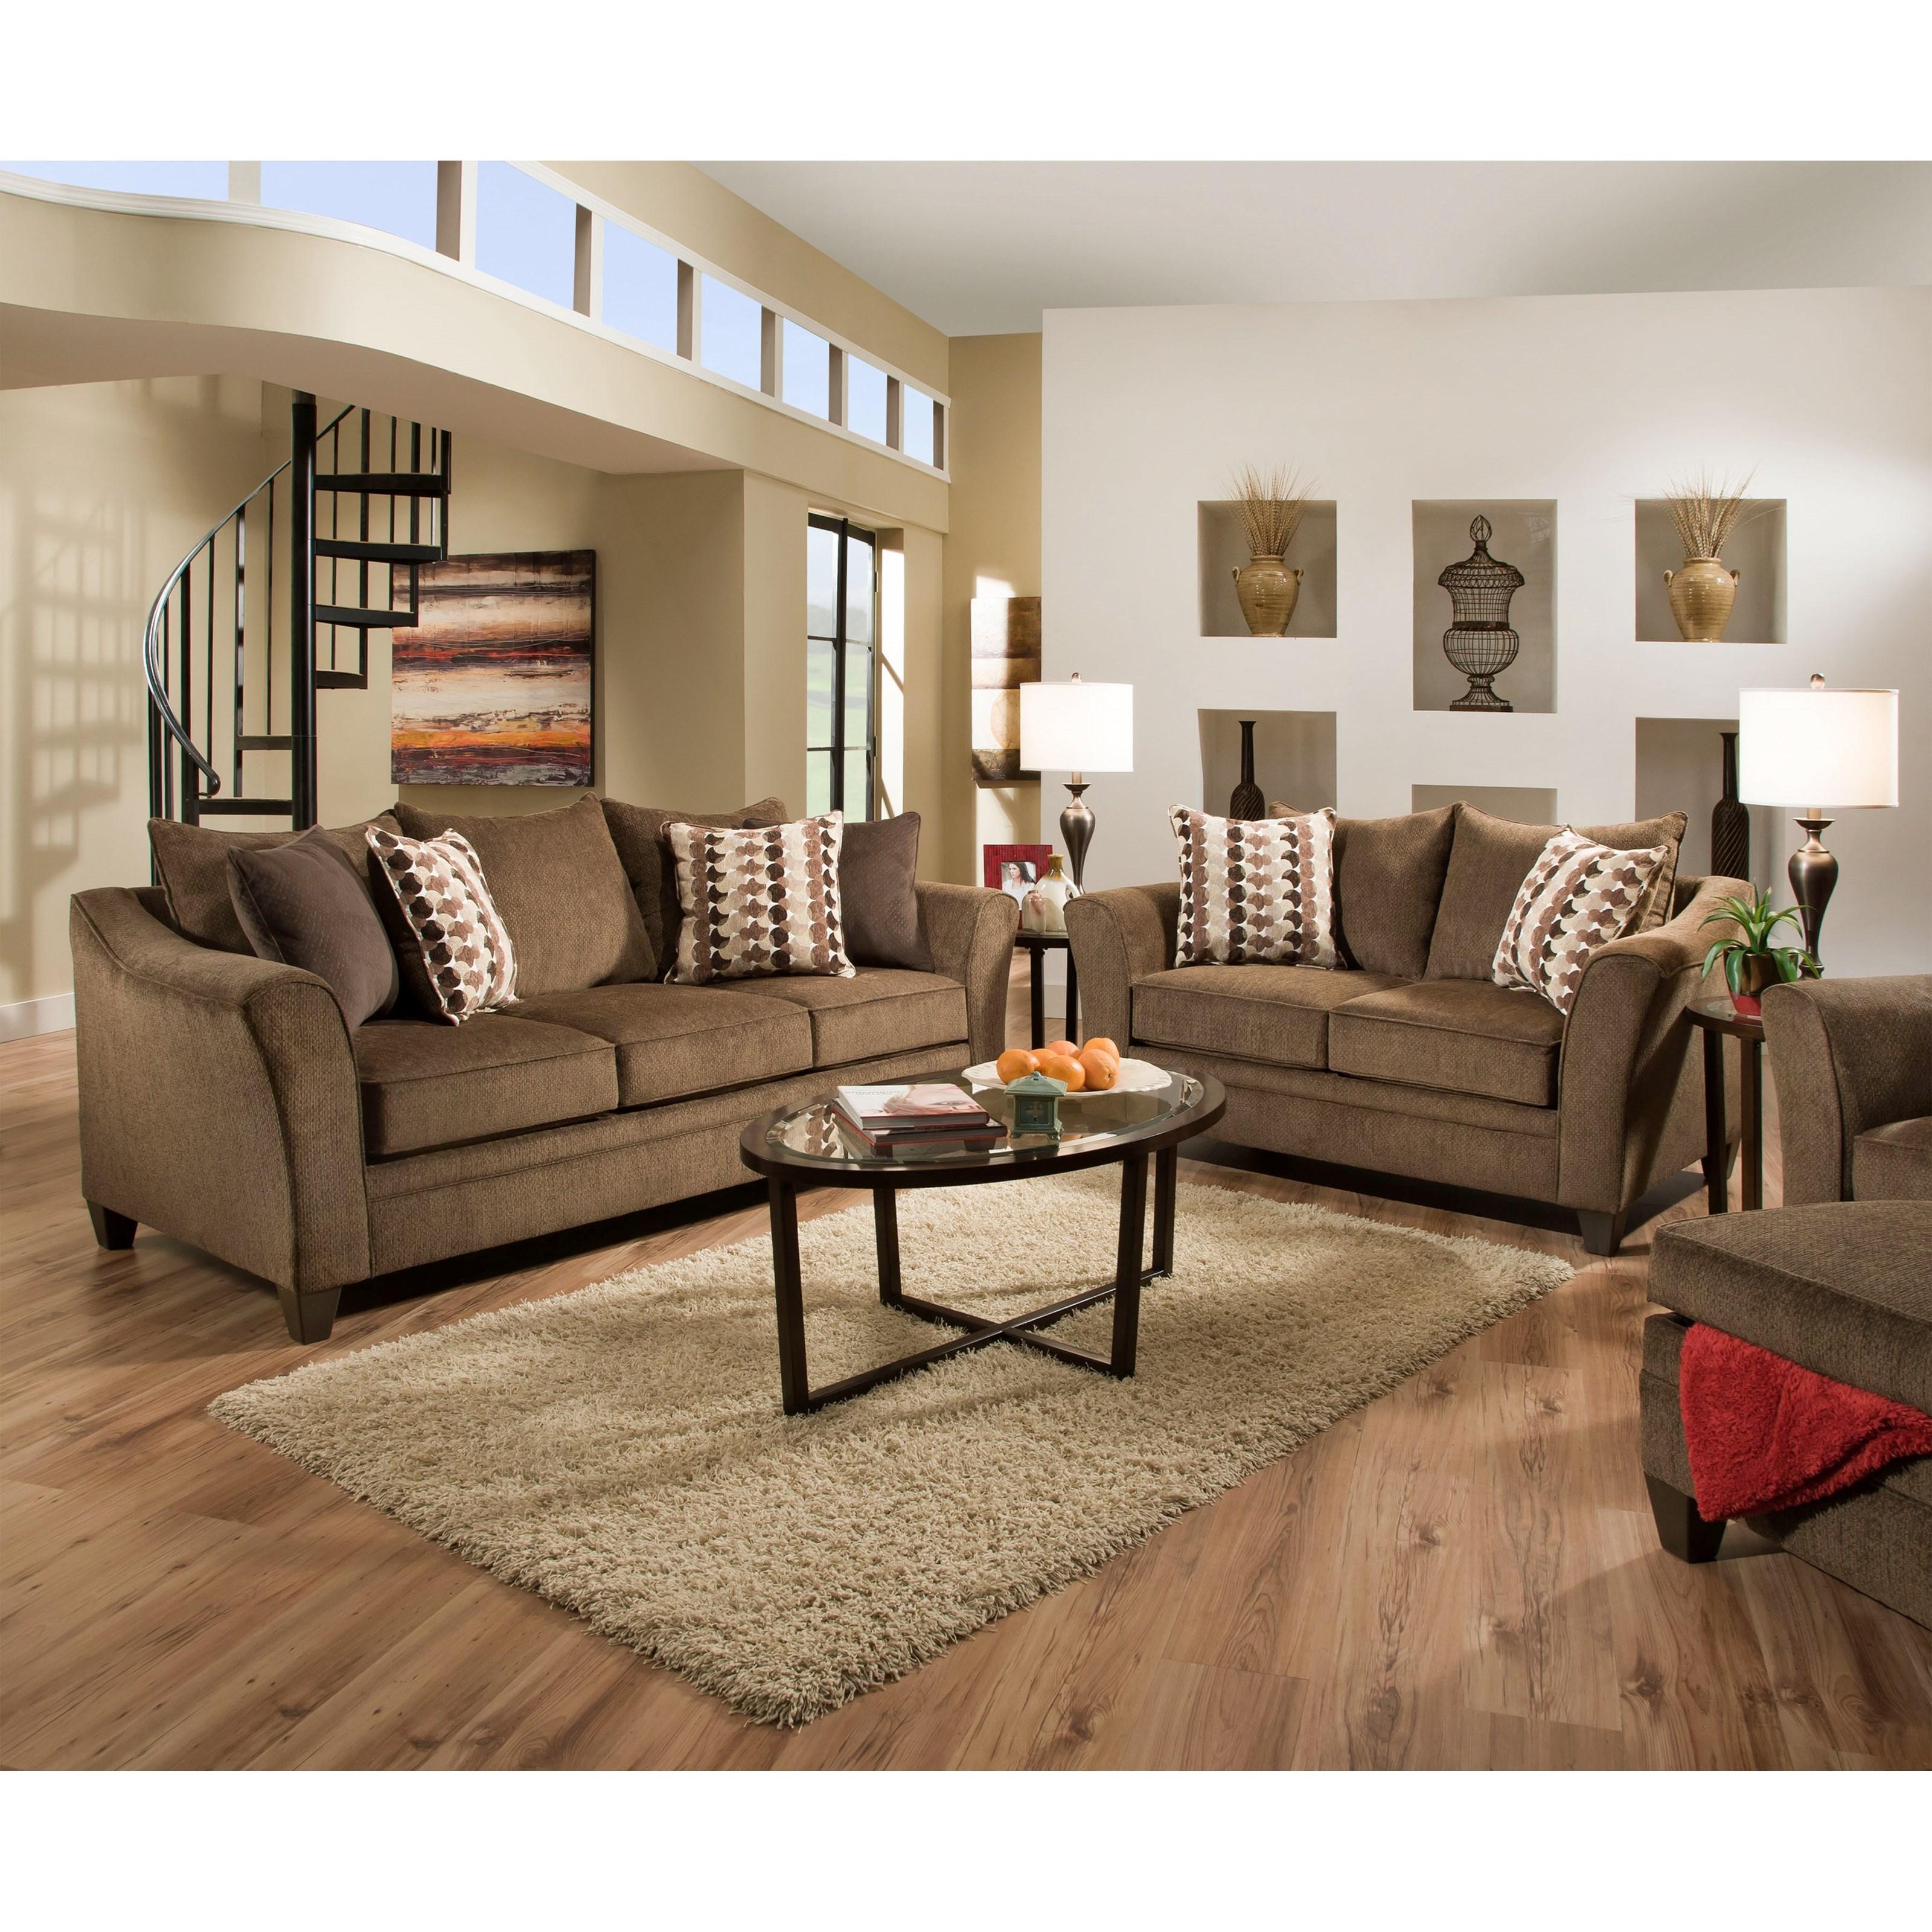 United Furniture Industries 1720 Sofa: United Furniture Industries 6485 6485Sofa Transitional